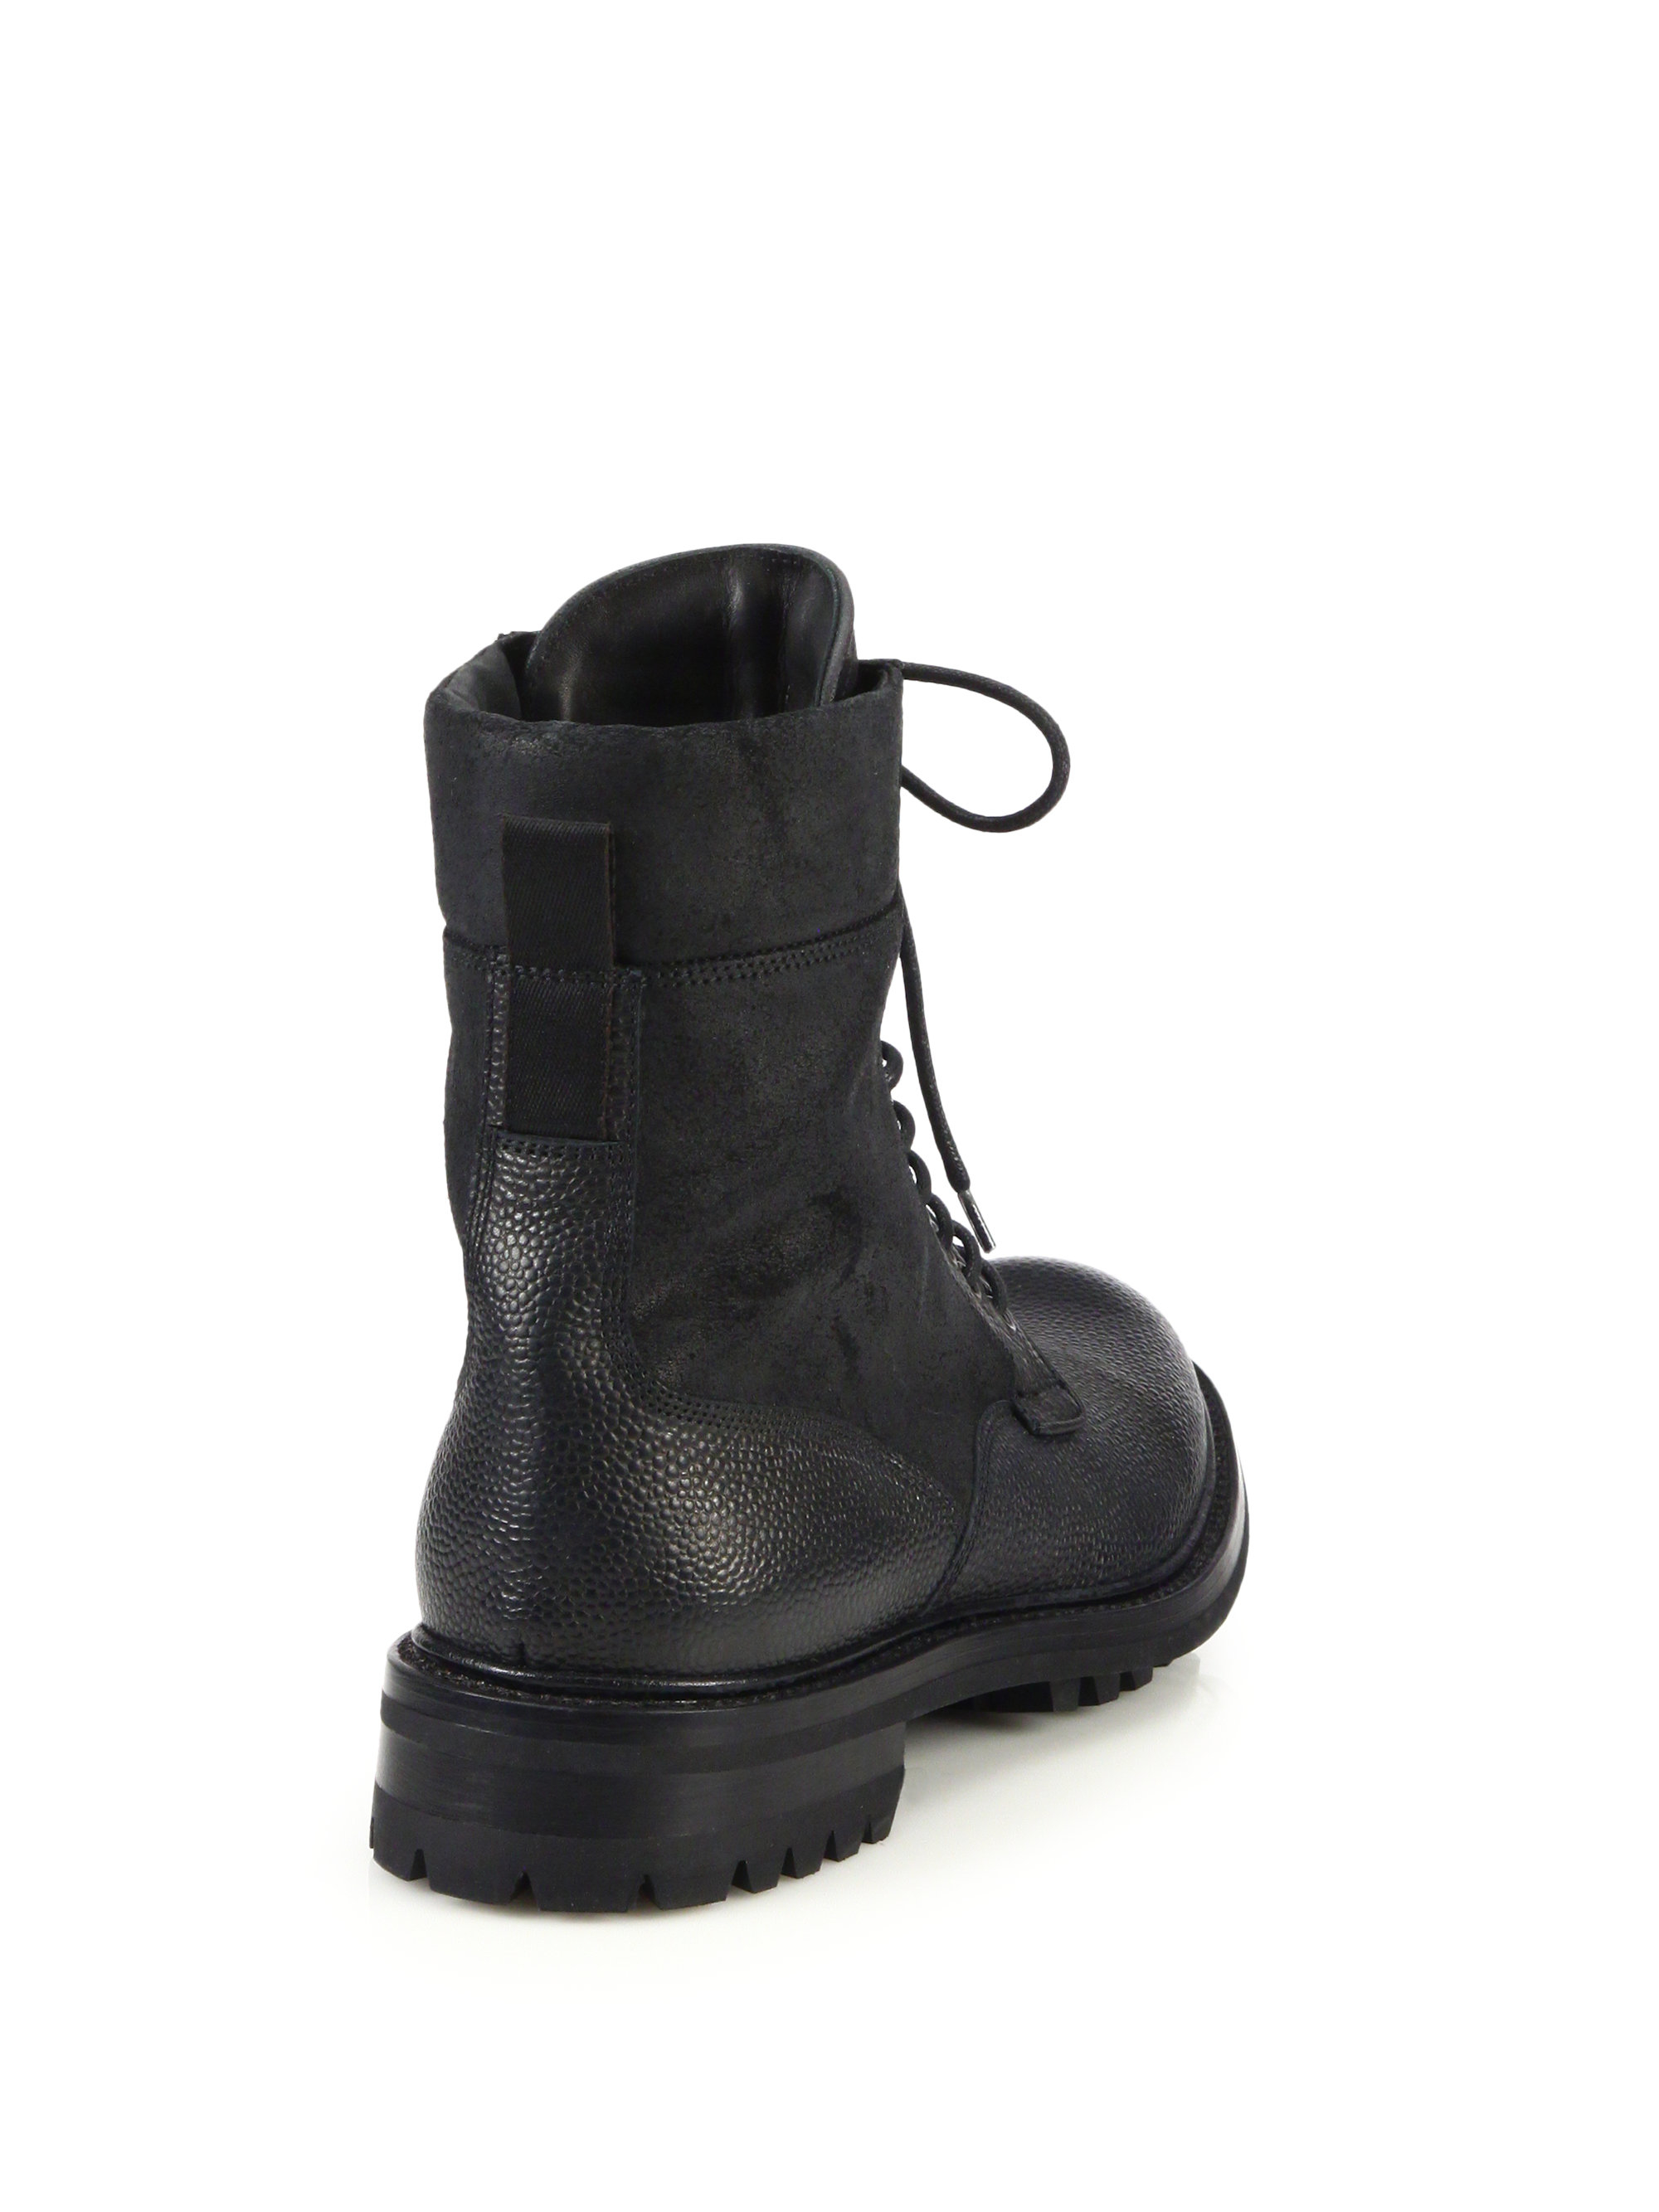 Rag Amp Bone Spencer Leather Commando Boots In Black For Men